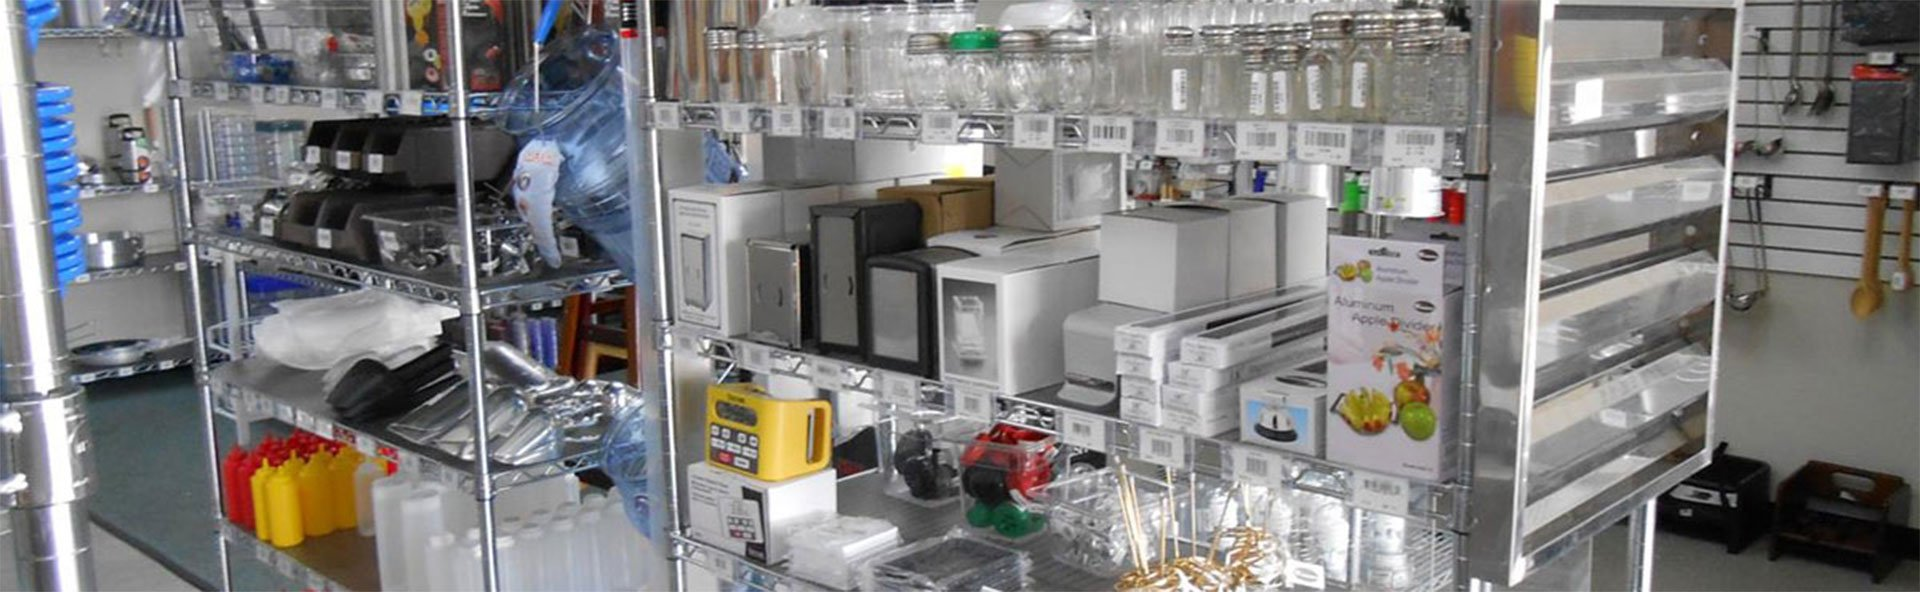 Restaurant equipment service raleigh nc the best equipment in 2017 - Kitchen equipment repair ...